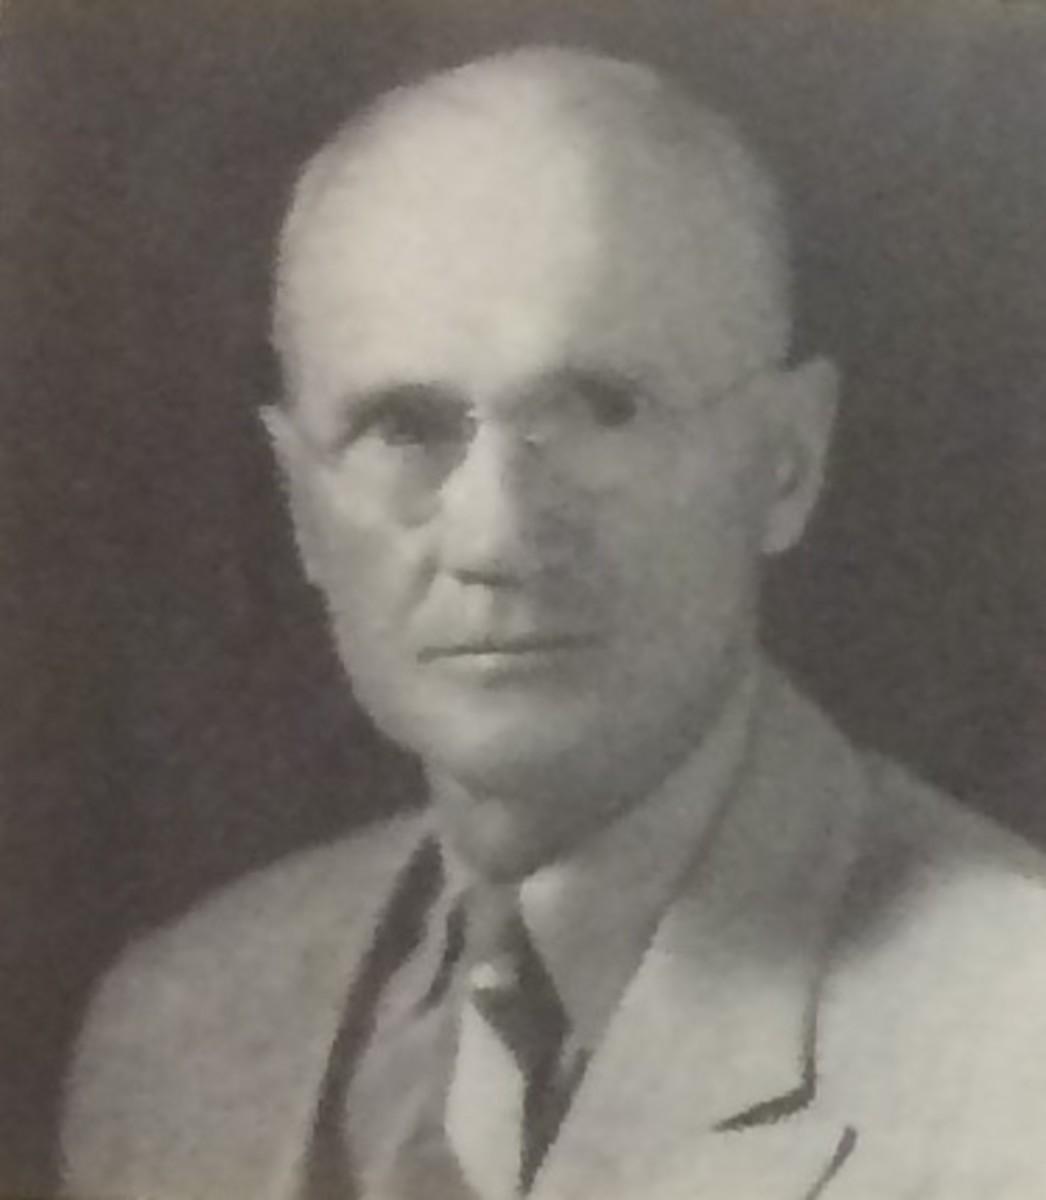 Pennsylvania Congressman Robert F. Rich